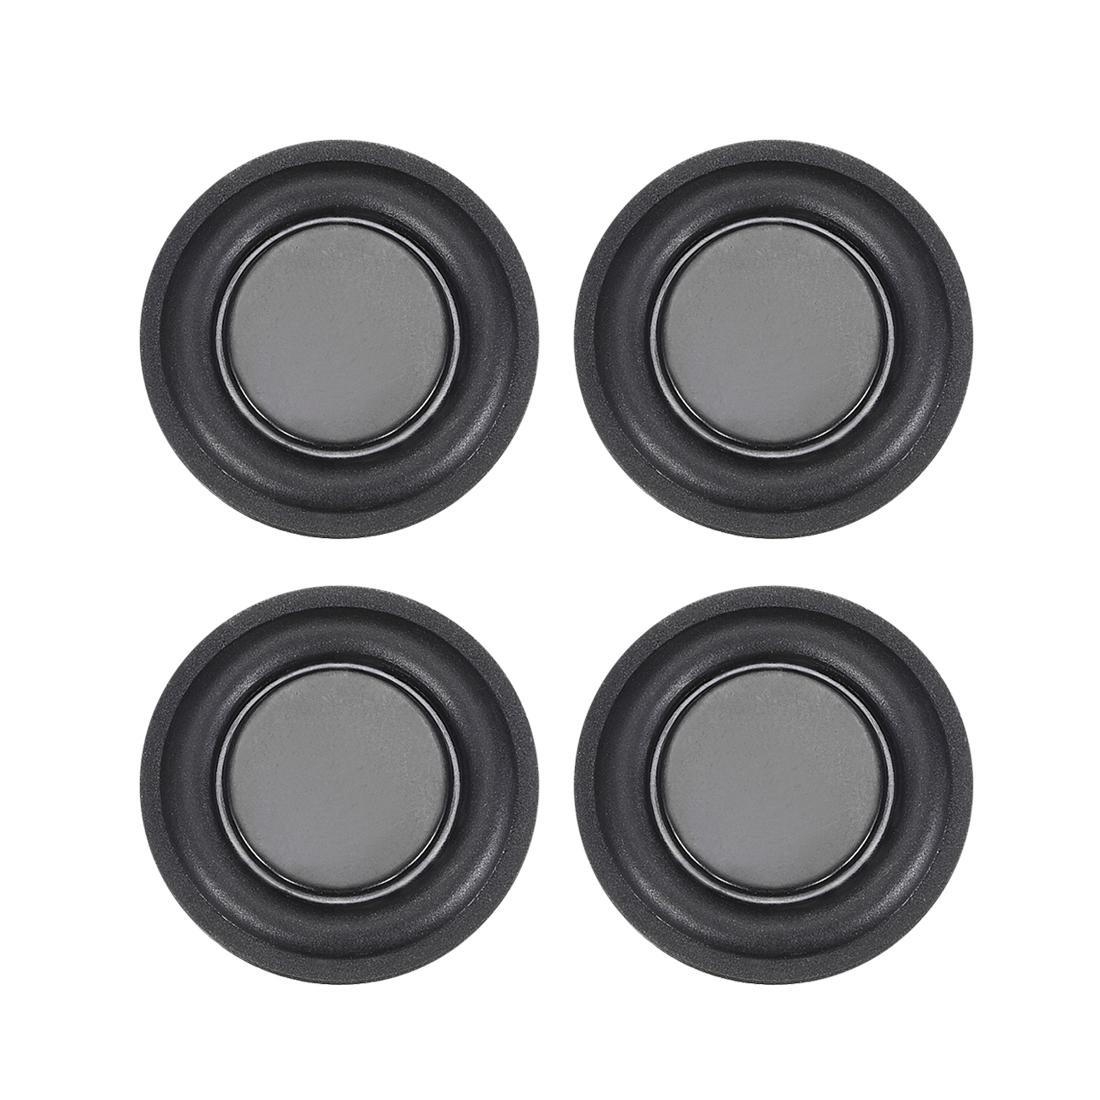 "4Pcs 1.25"" 32mm Bass Speaker Passive Radiator Rubber Vibration Plate DIY Repair"